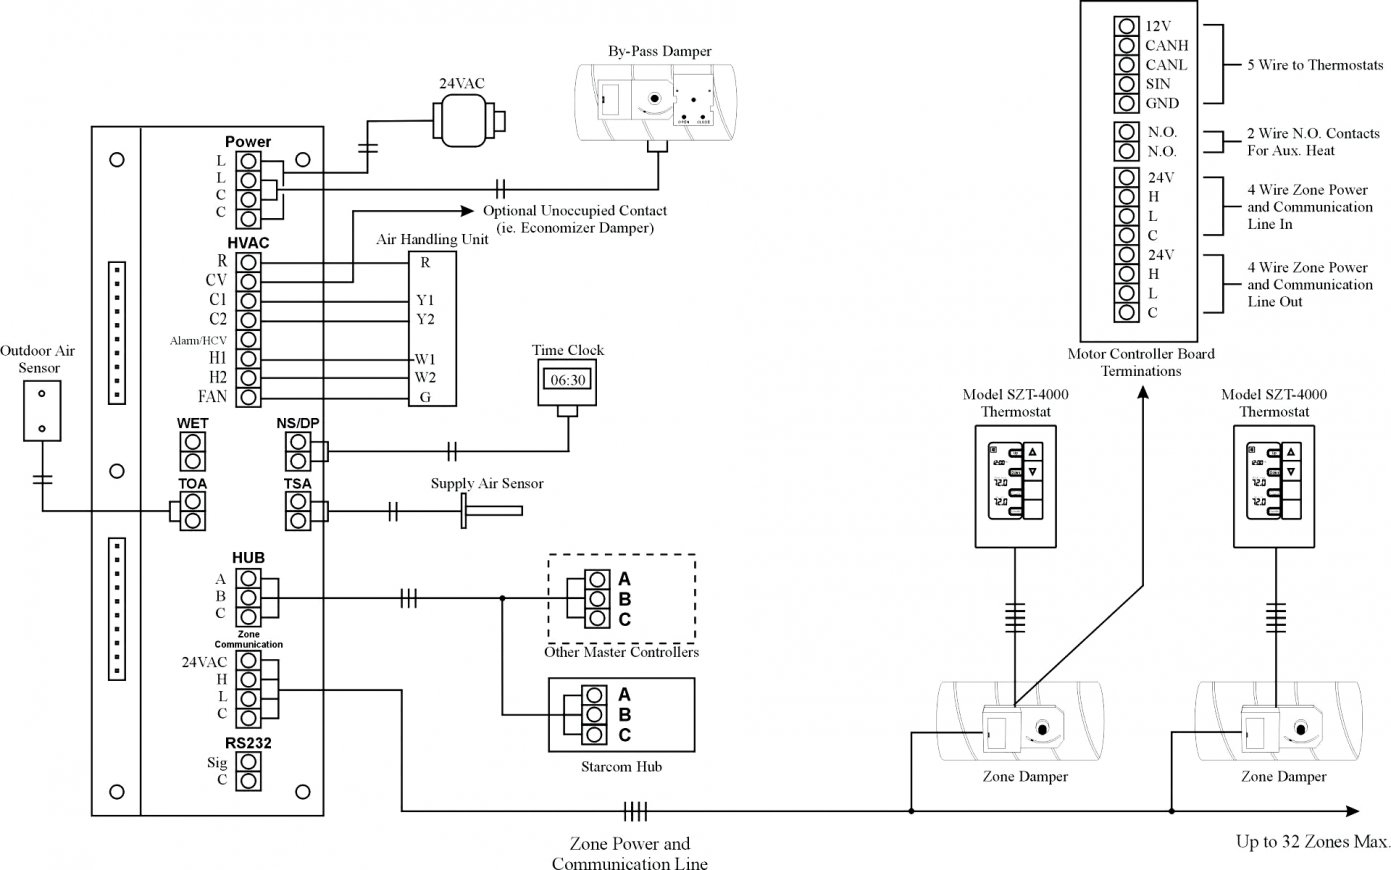 Wiring 3 Wire Smoke Detectors | Wiring Diagram - 2 Wire Smoke Detector Wiring Diagram